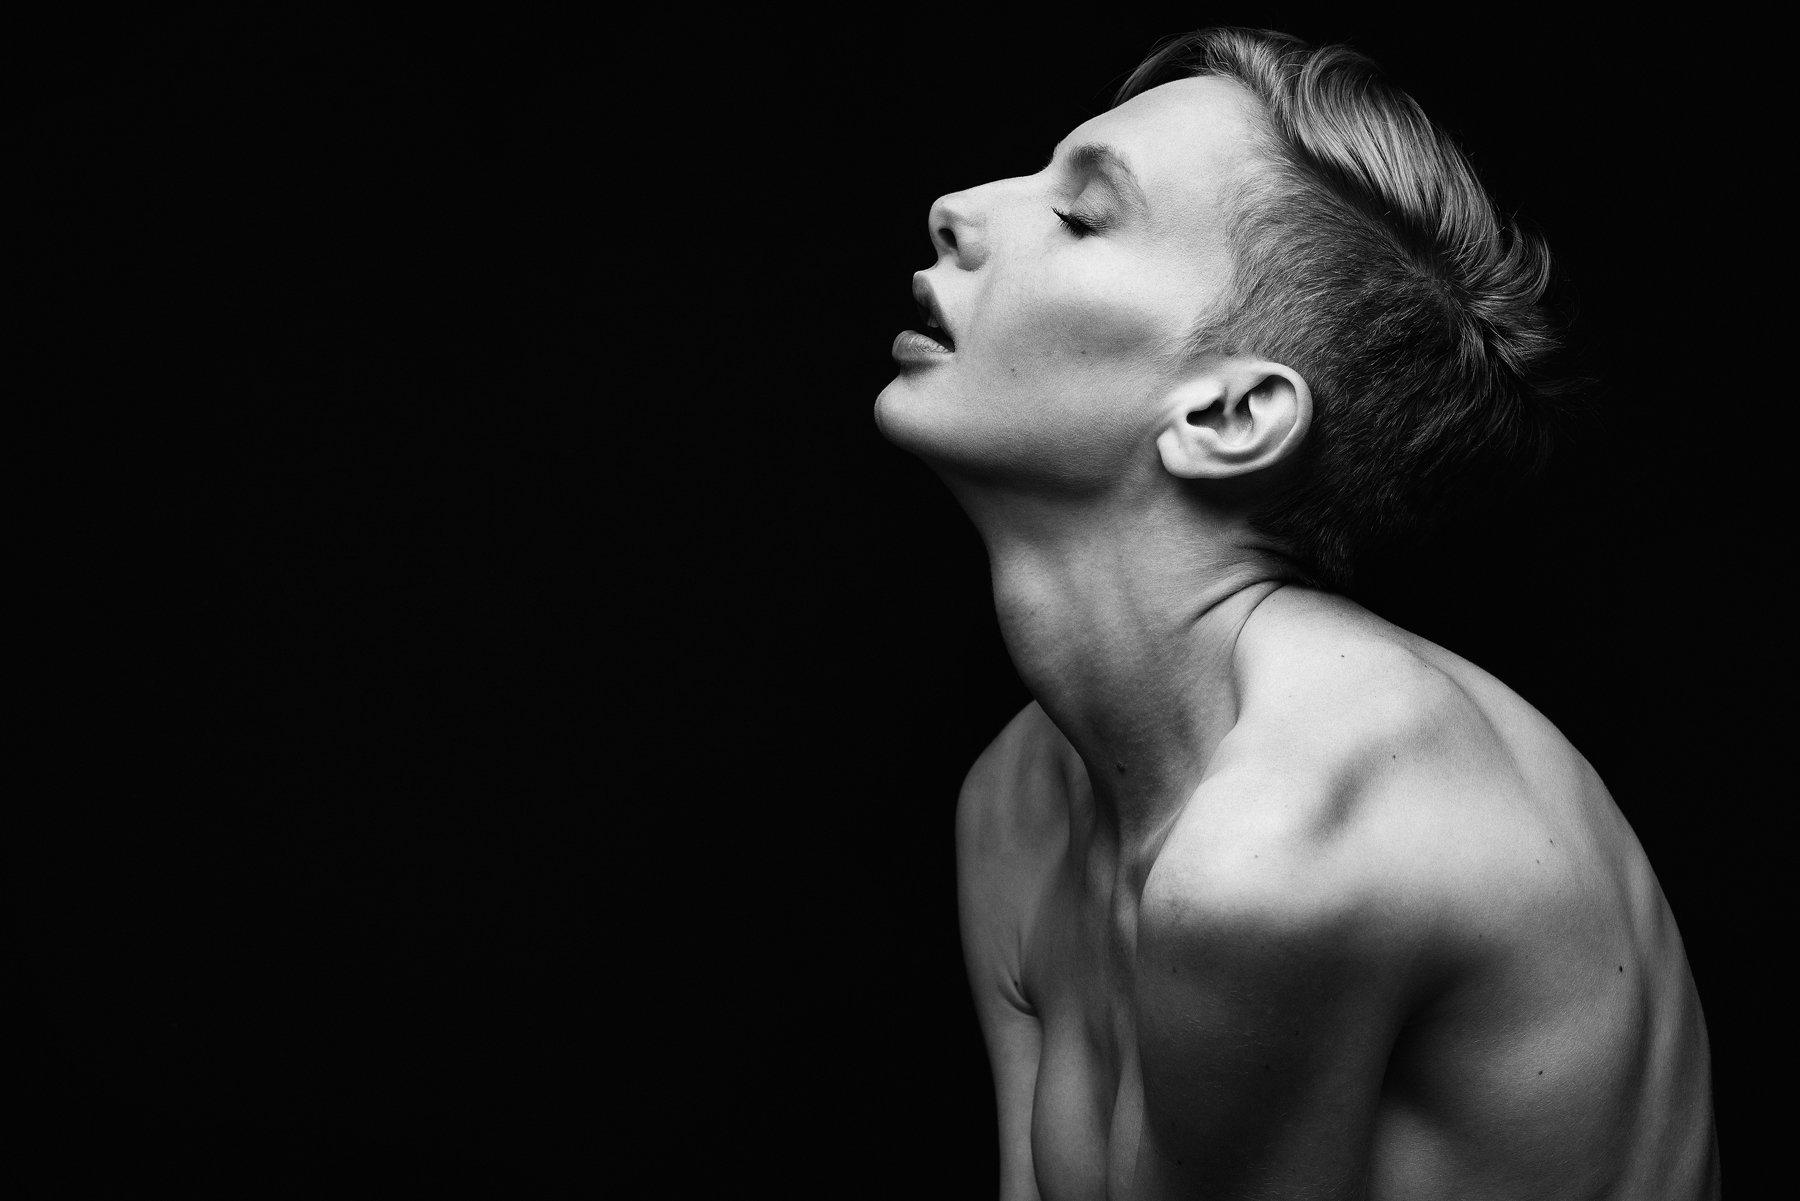 #blackandwhite, #sensual, #portrait, Georgi Todorov